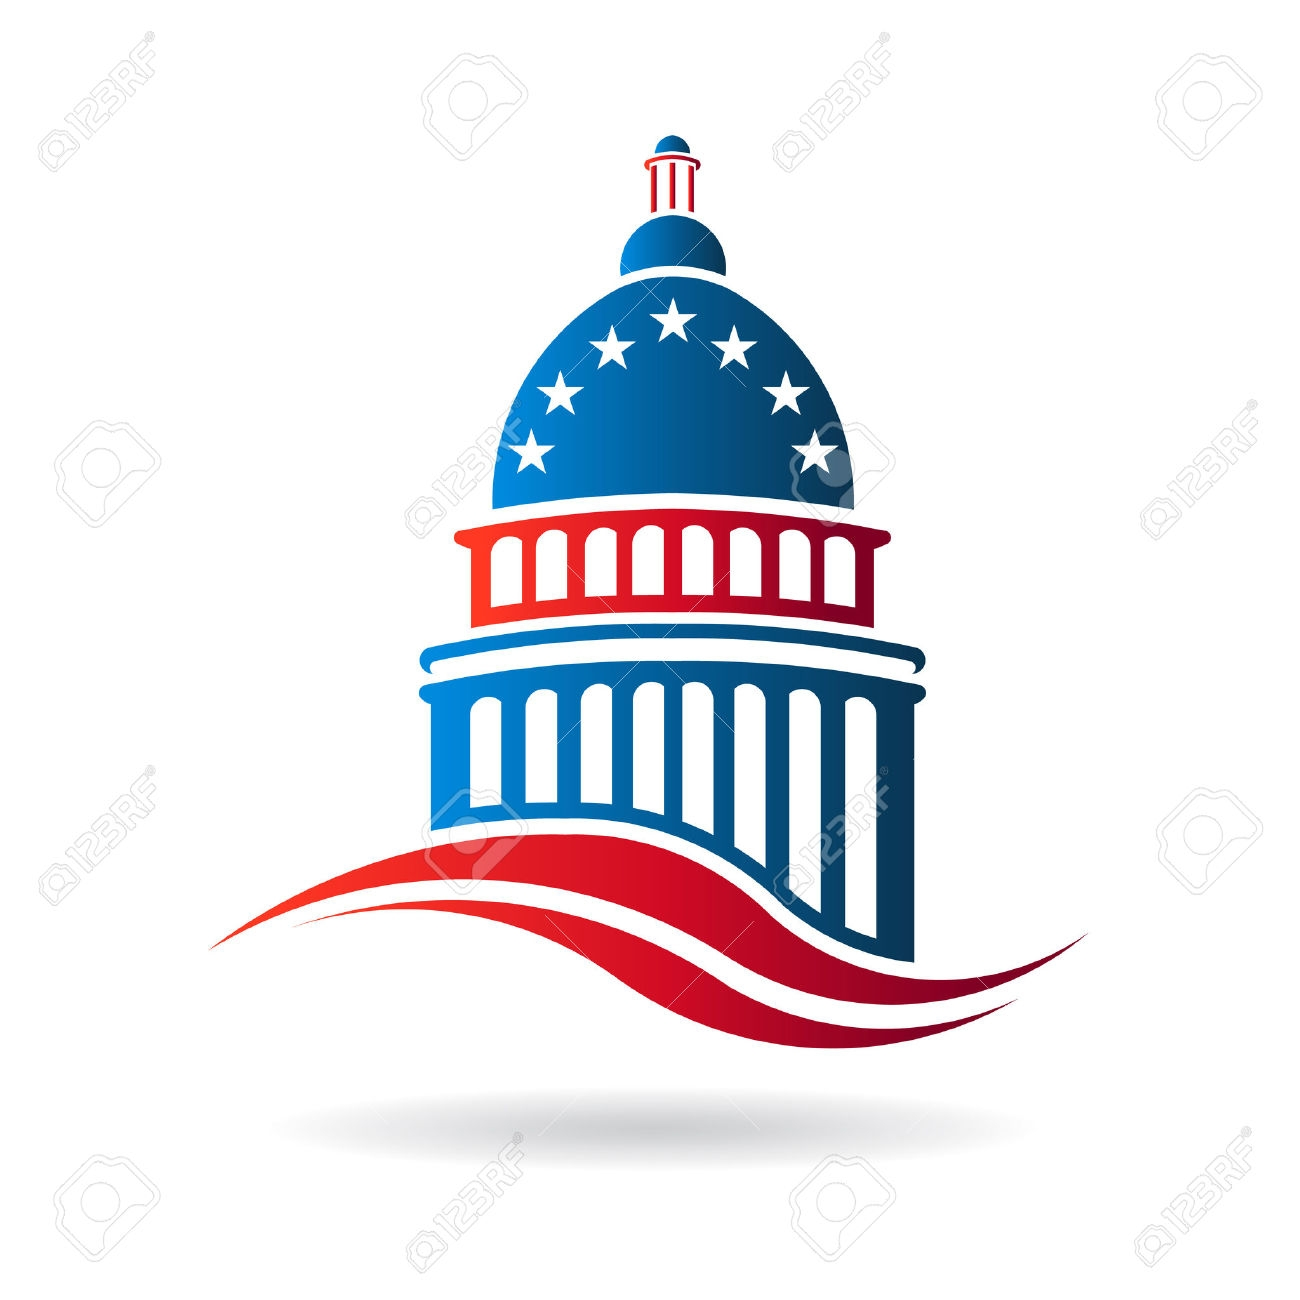 Capitol Building Clipart.